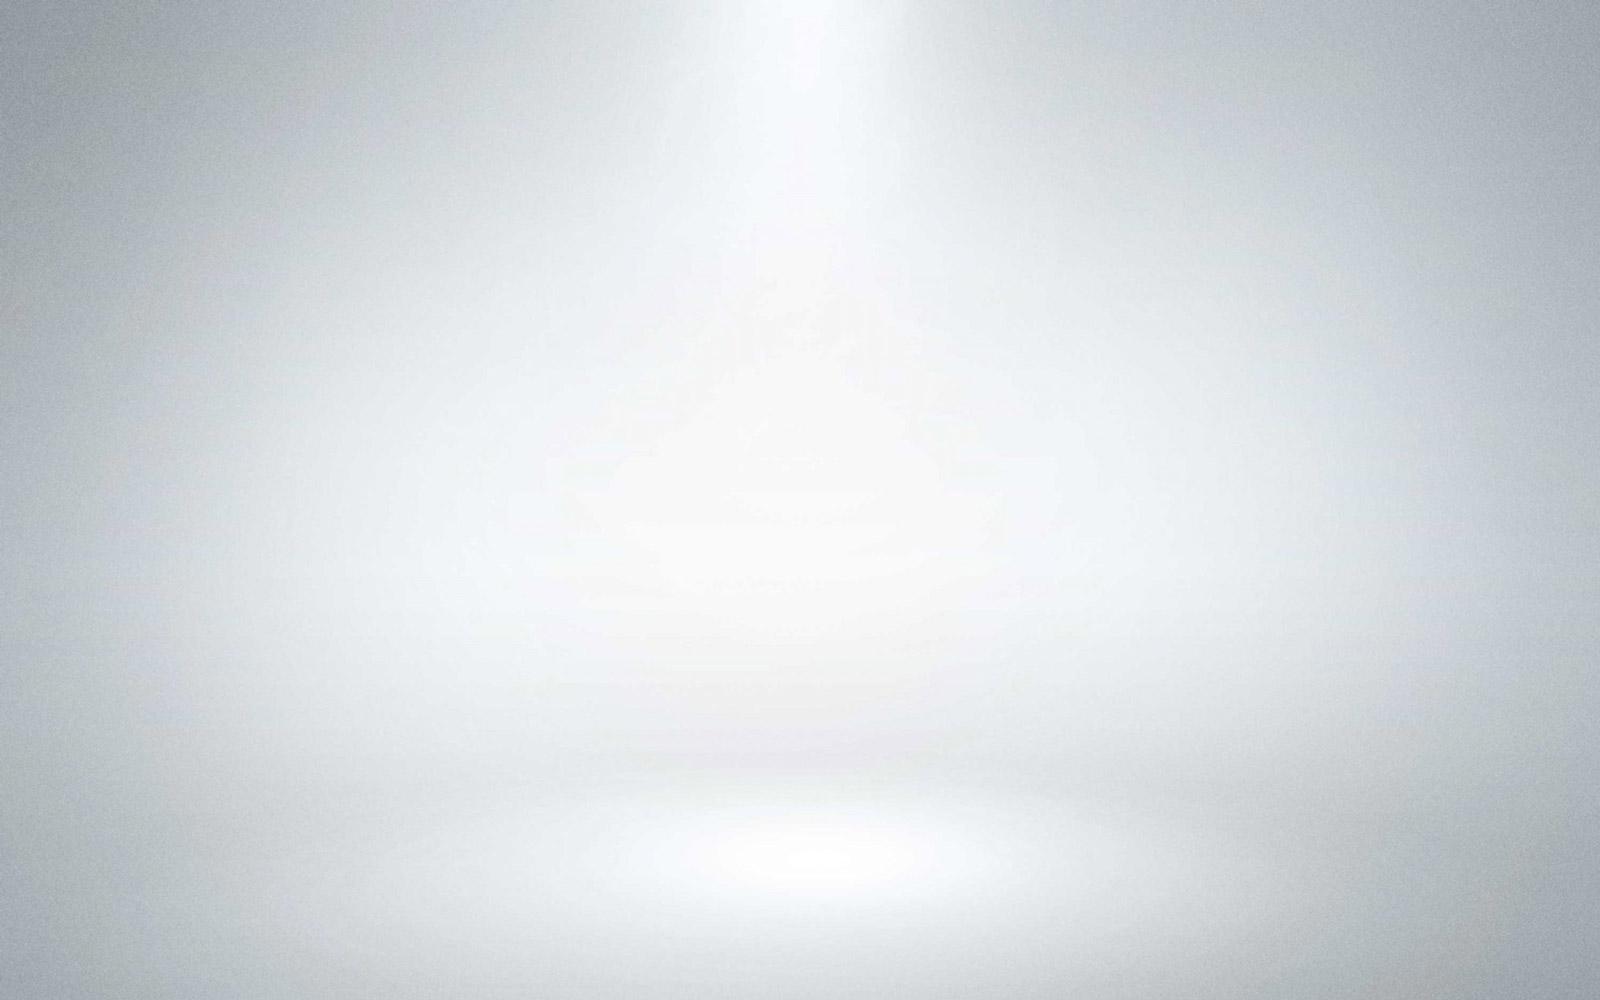 6_elegant_BW_spotlight_background-e1387228836549